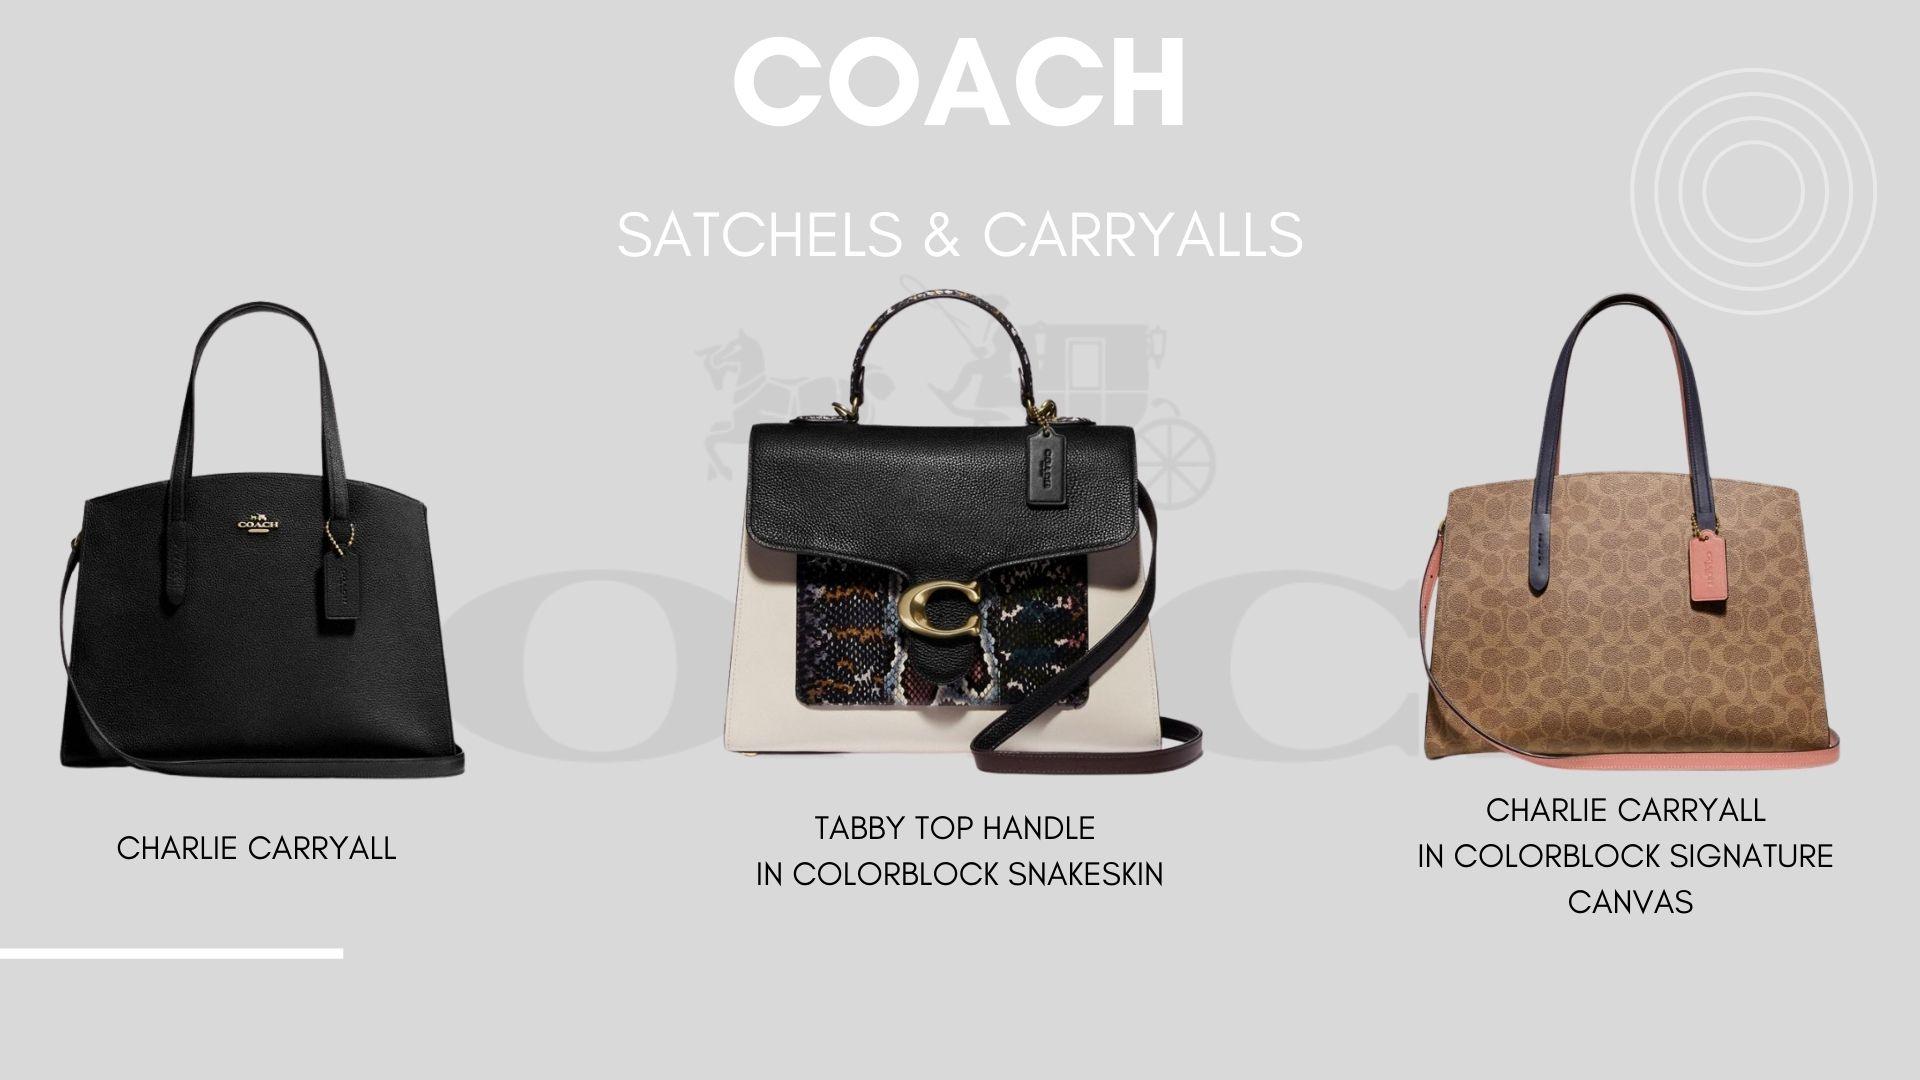 Coach Satchels & Carryalls